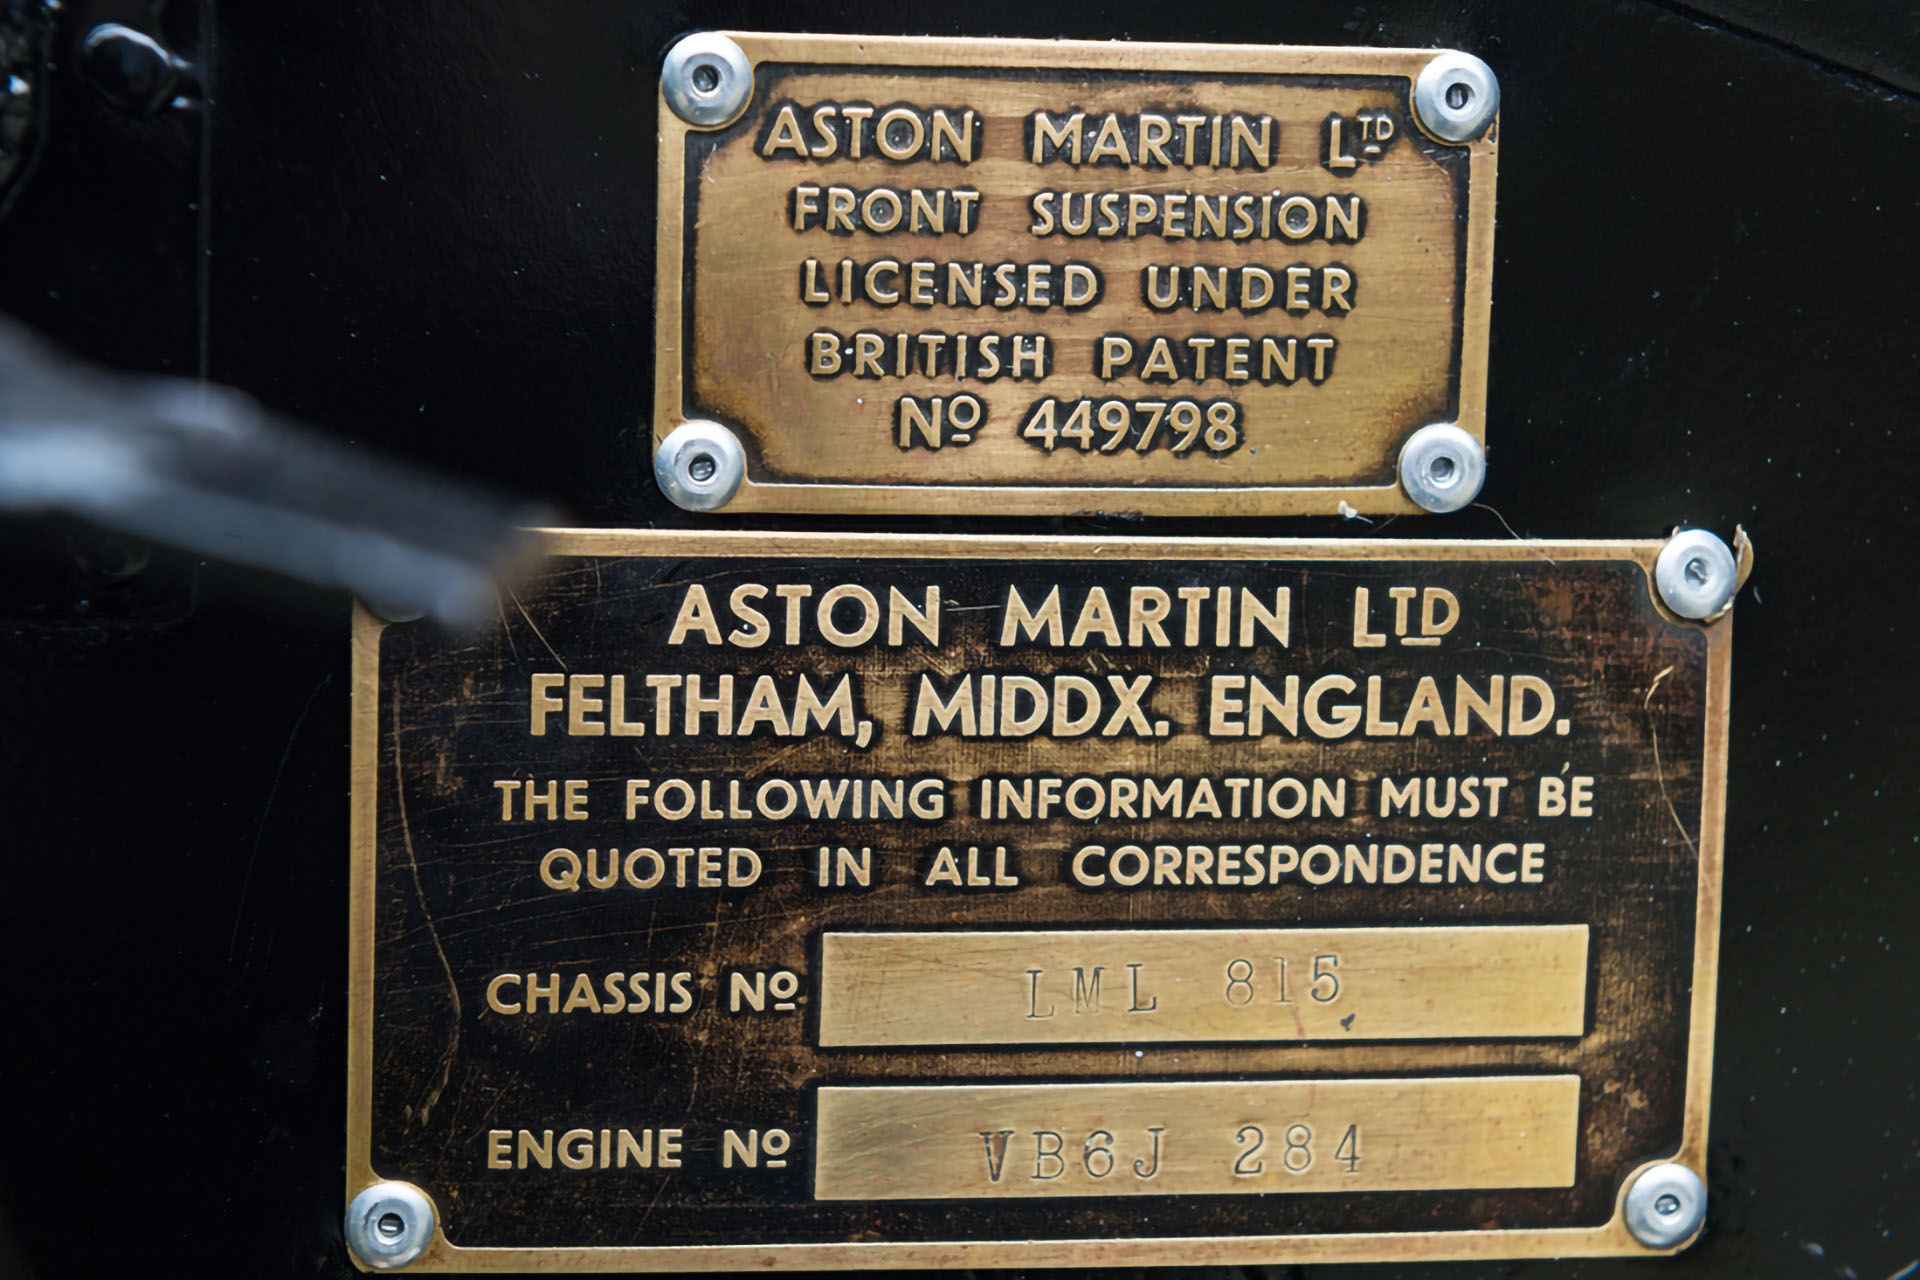 1955 ASTON MARTIN DB 2/4 MK I